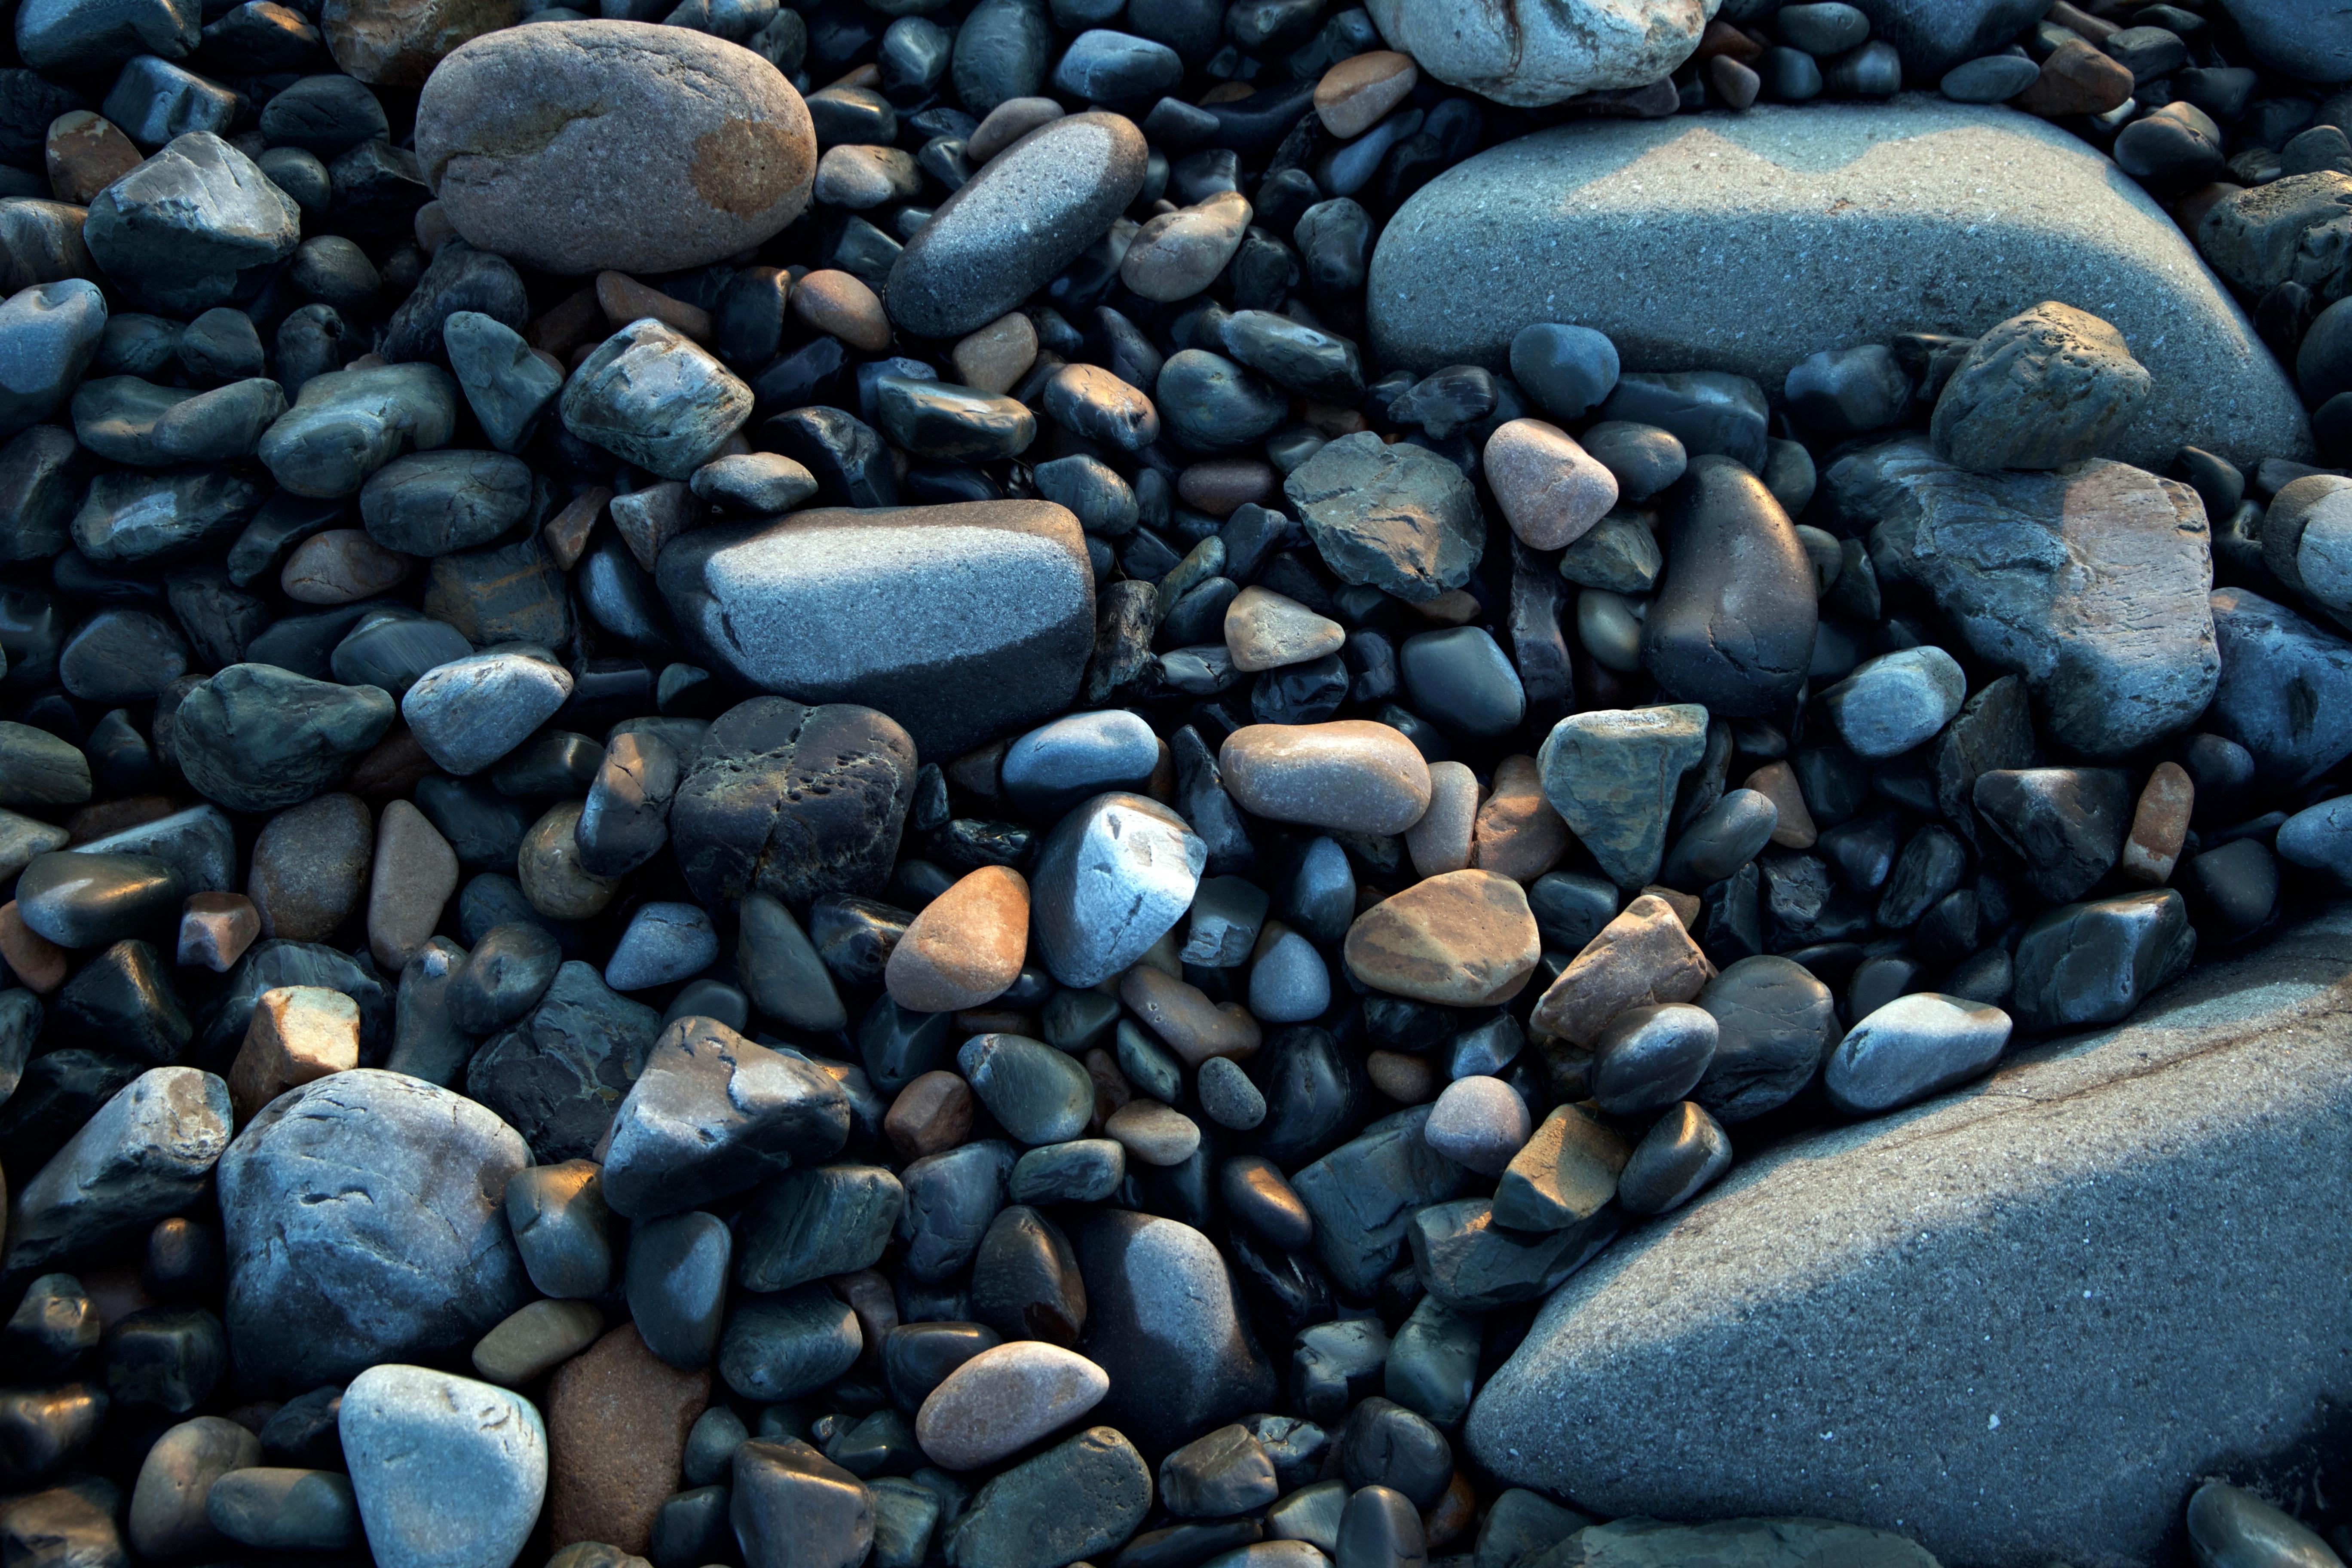 Free Images : rock, pebble, soil, blue, material, rocks